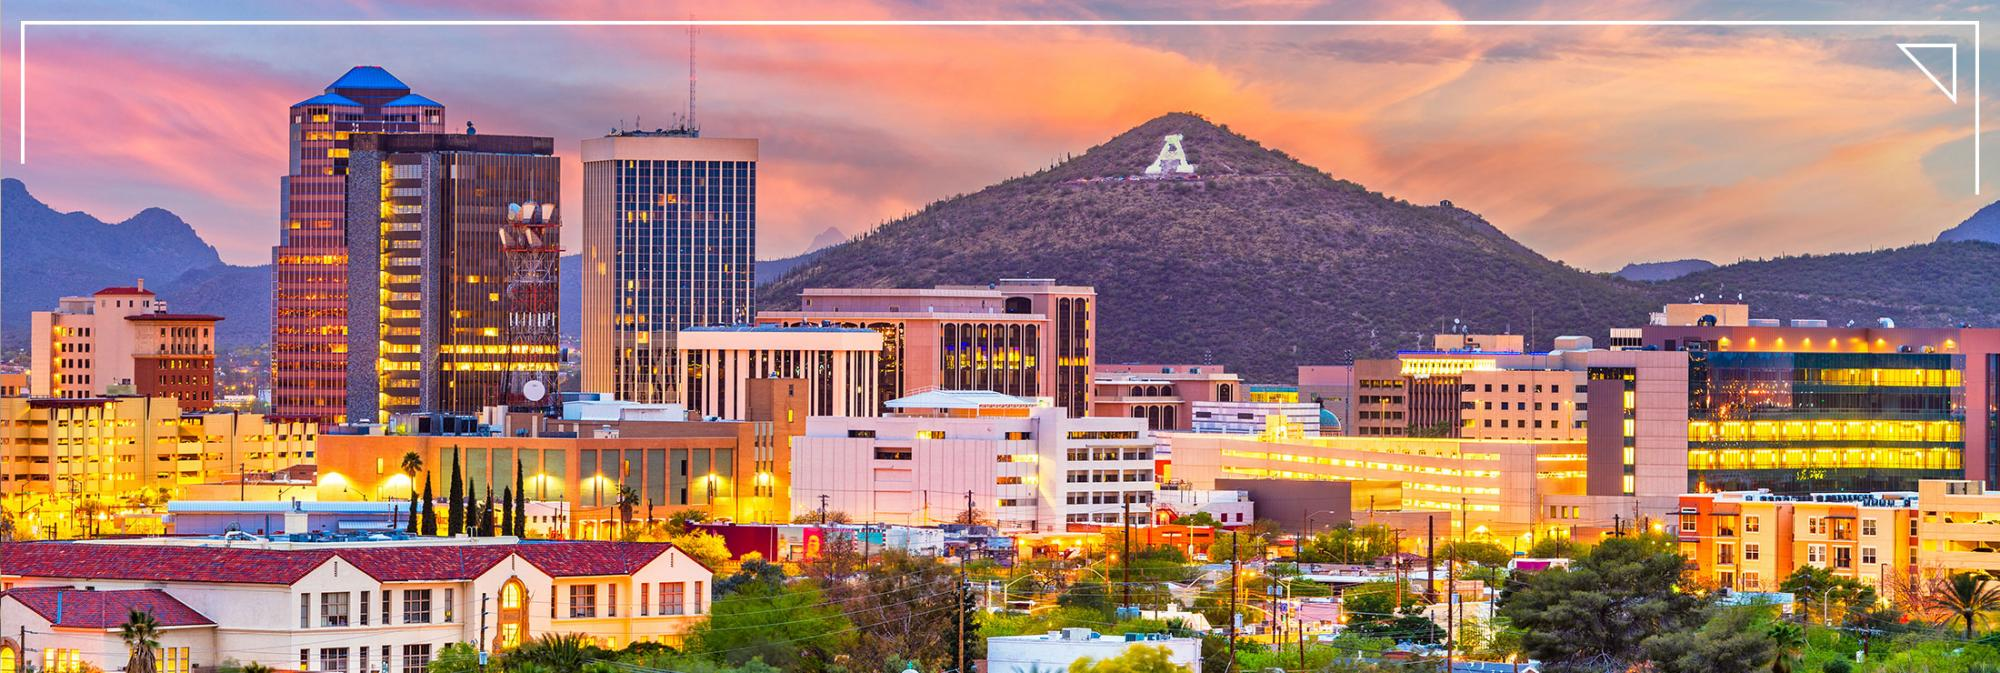 Tucson at sunset